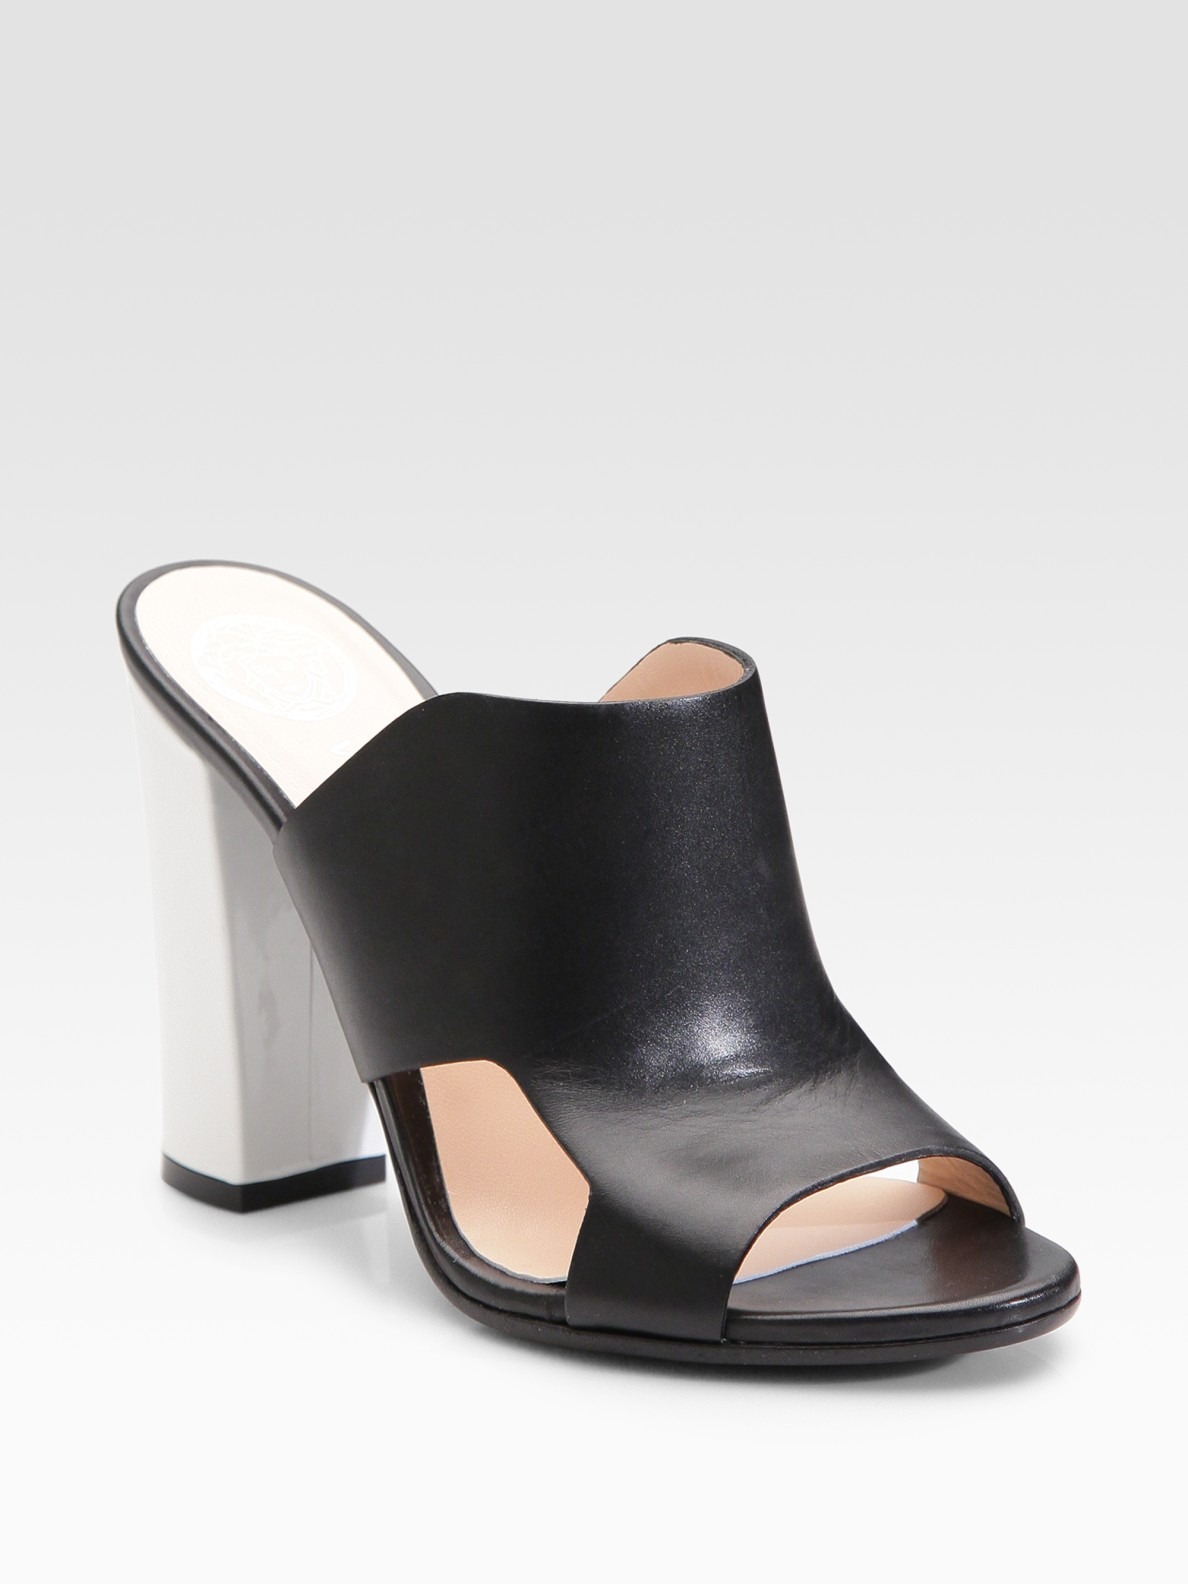 Versace Cutout Mule Sandals in Black | Lyst